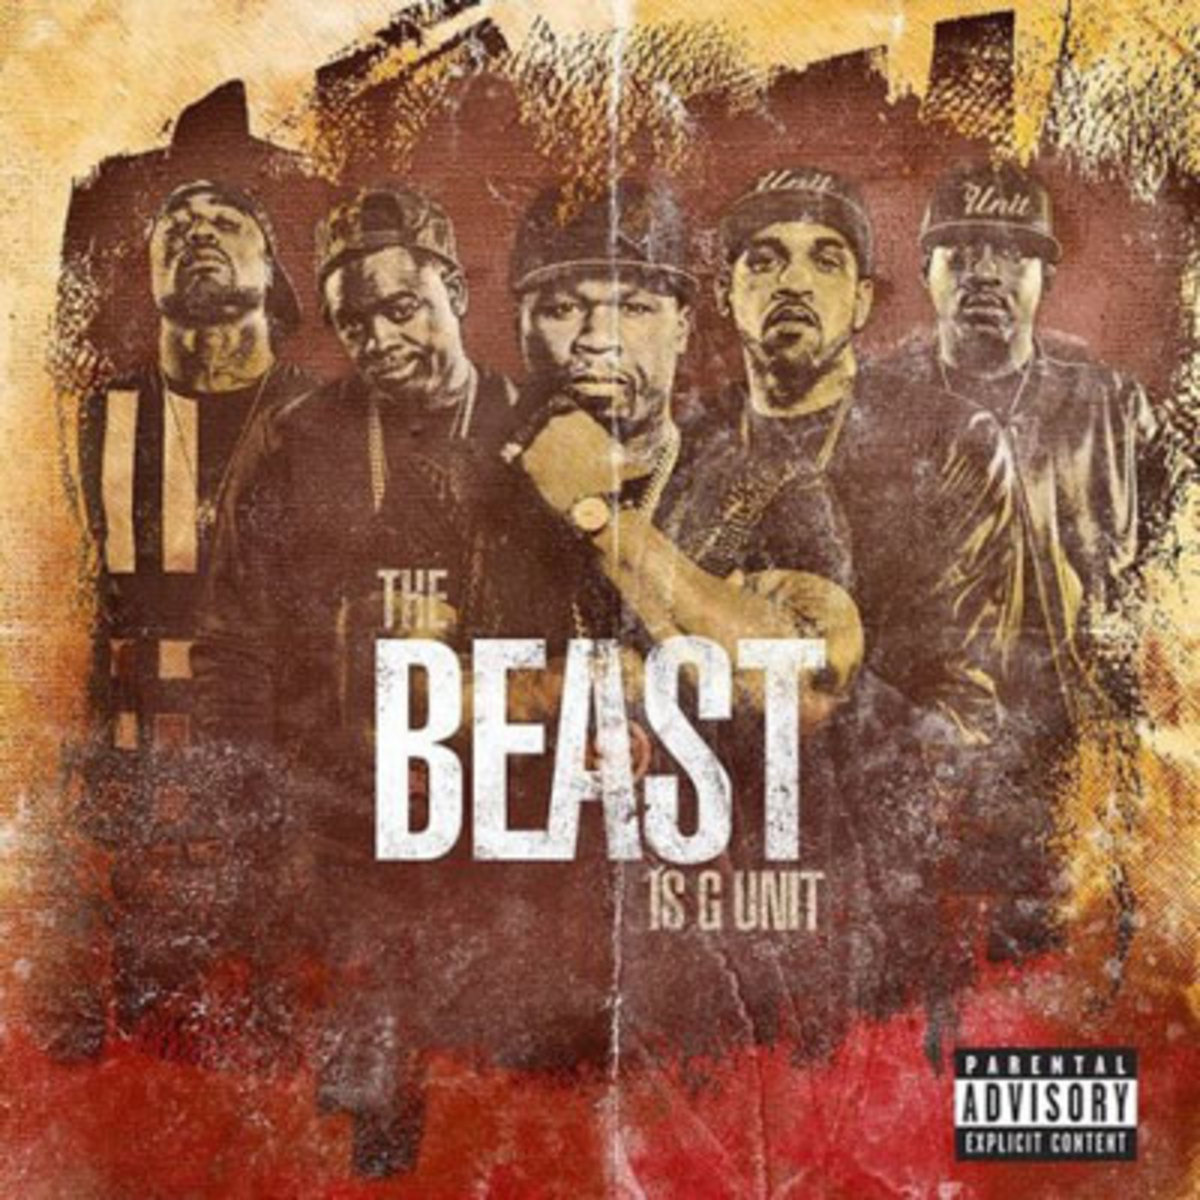 g-unit-the-beast-is-g-unit.jpg